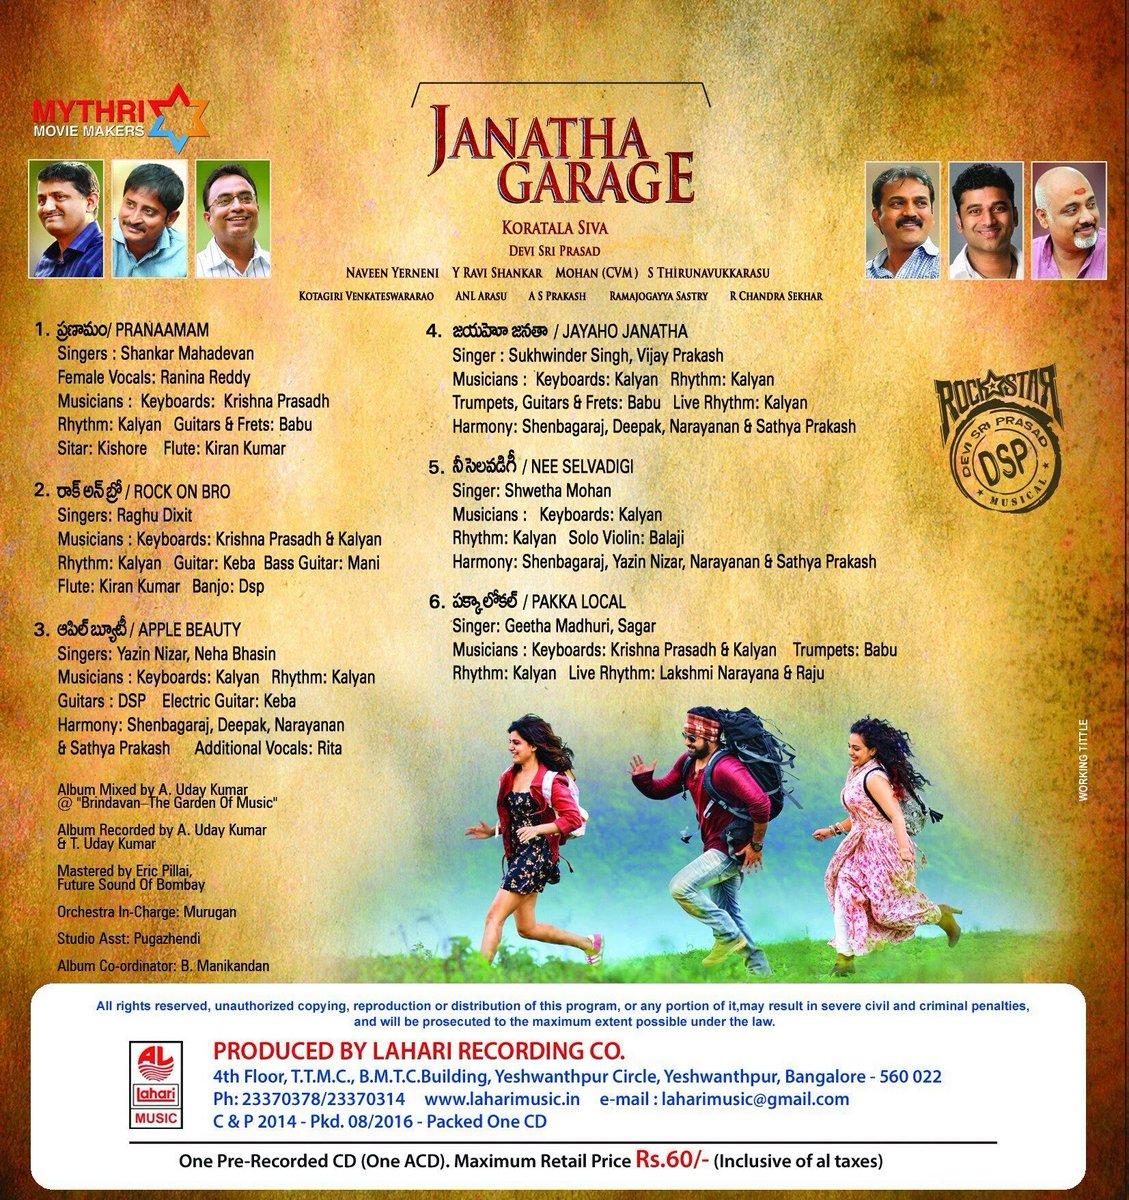 Telugusongs: ♫ jr. Ntr ♫ janatha garage (2016) telugu mp3 songs.